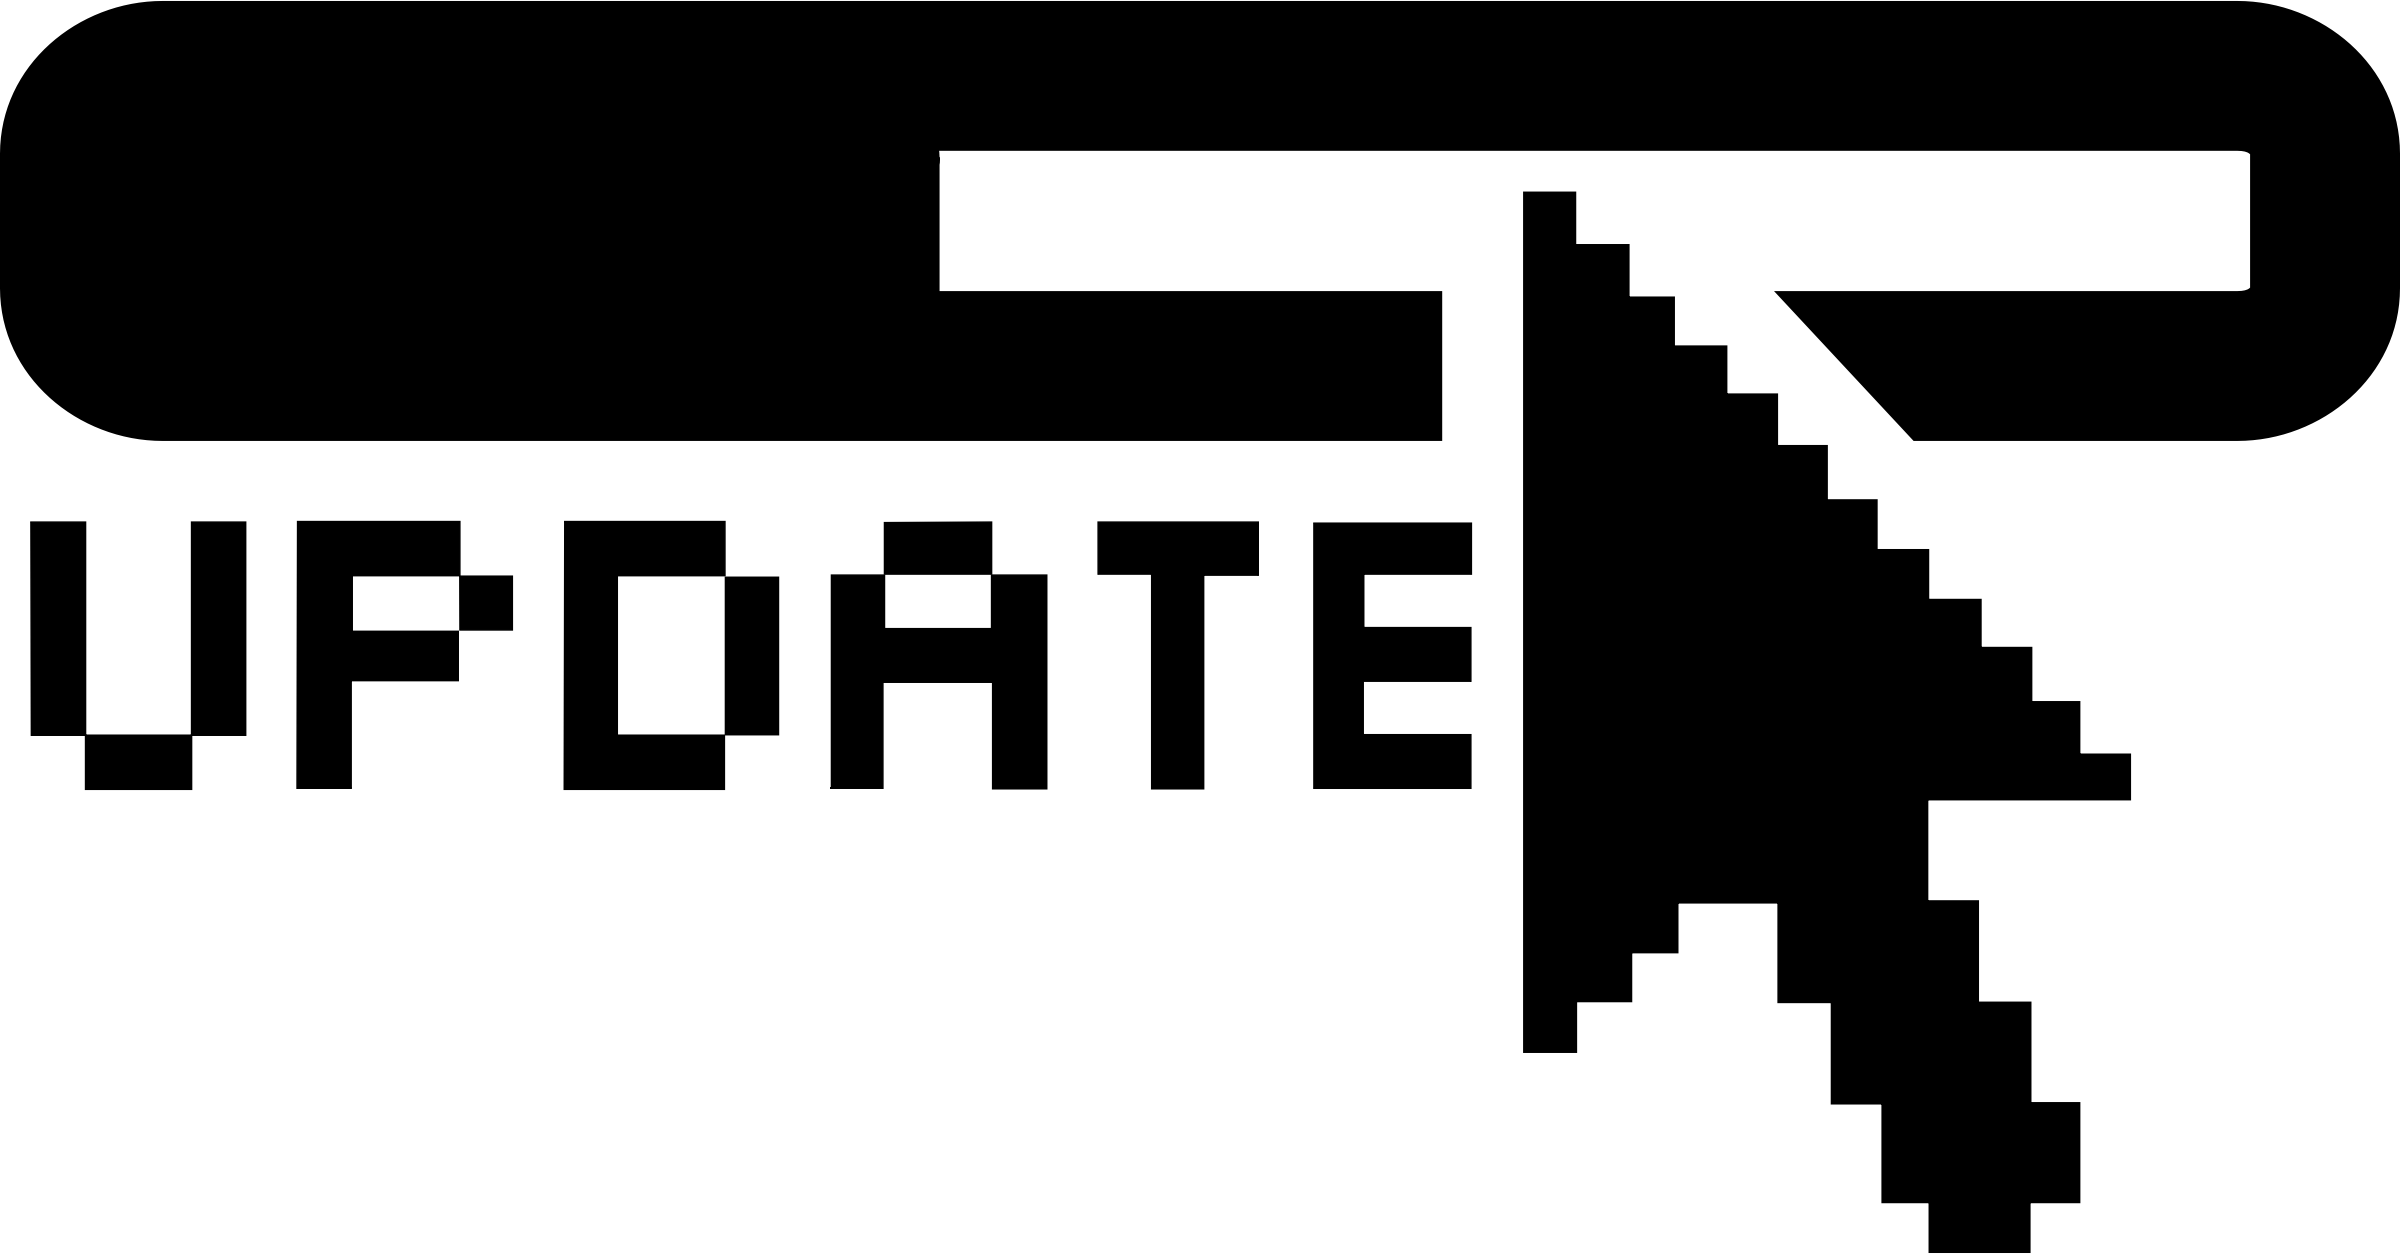 svg stock Update clipart. Logo big image png